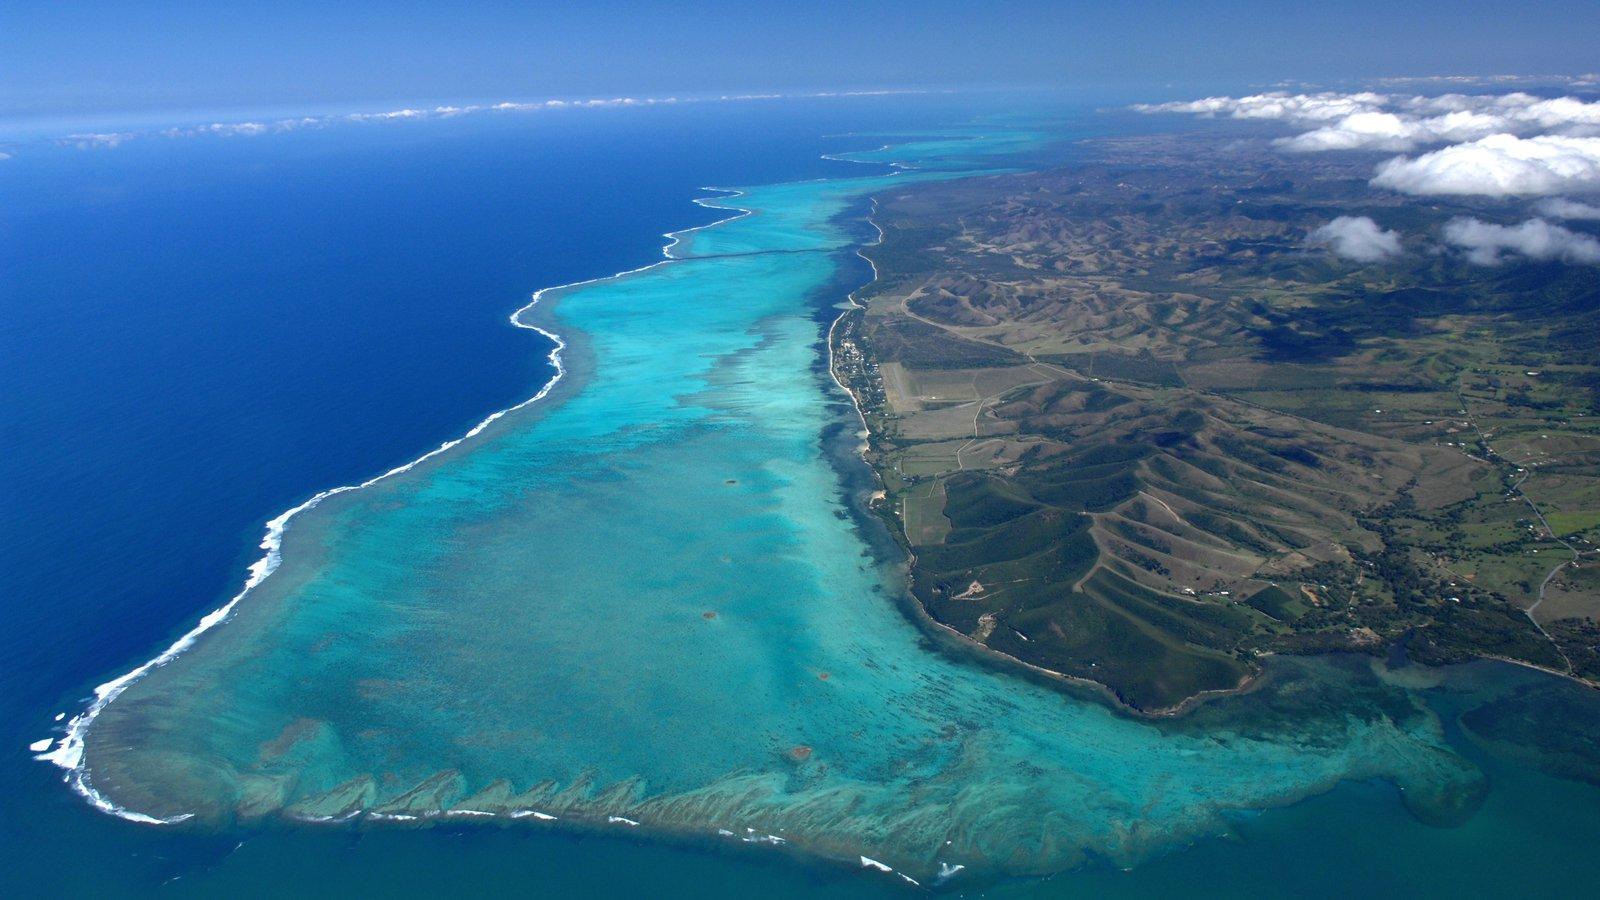 M68 compressional earthquake near New Caledonia triggers swarm 1600x900